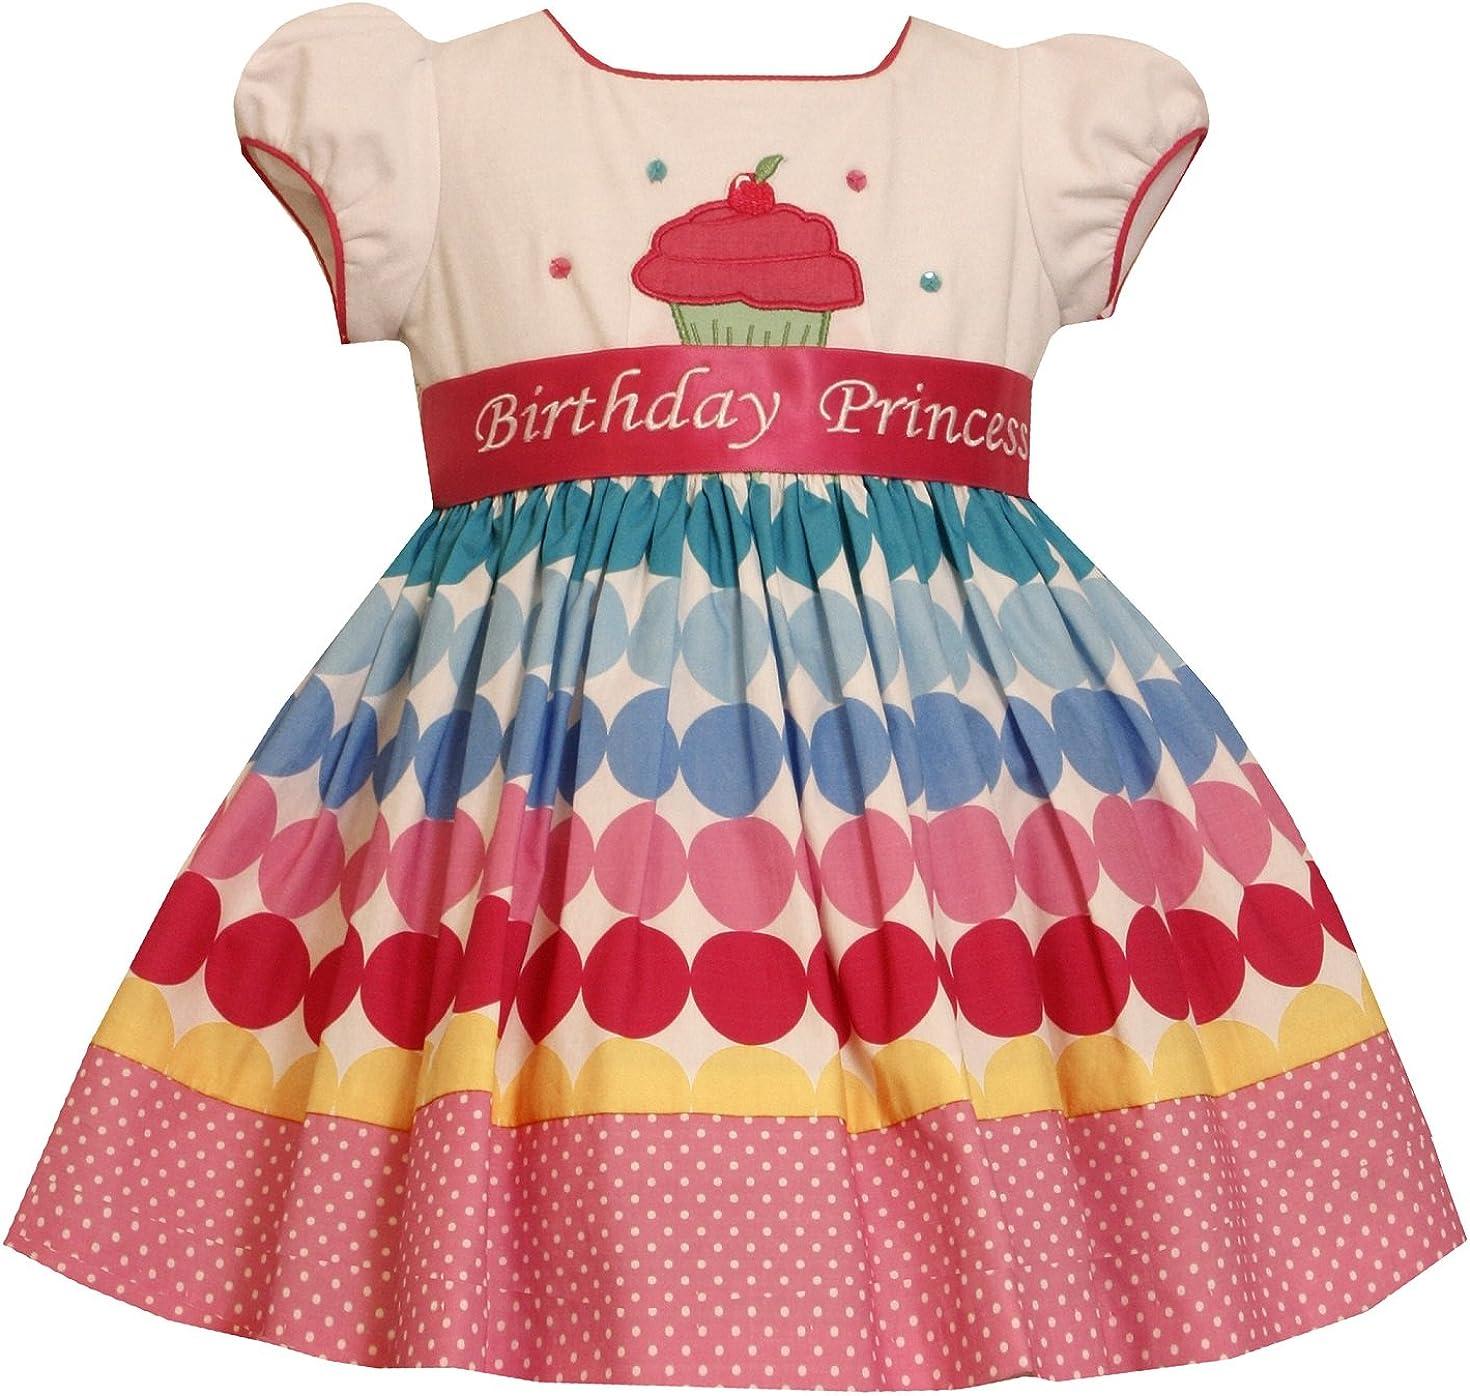 Bonnie Jean Girls Princess Polka Dot Cupcake Birthday Party Dress 12M 4T New